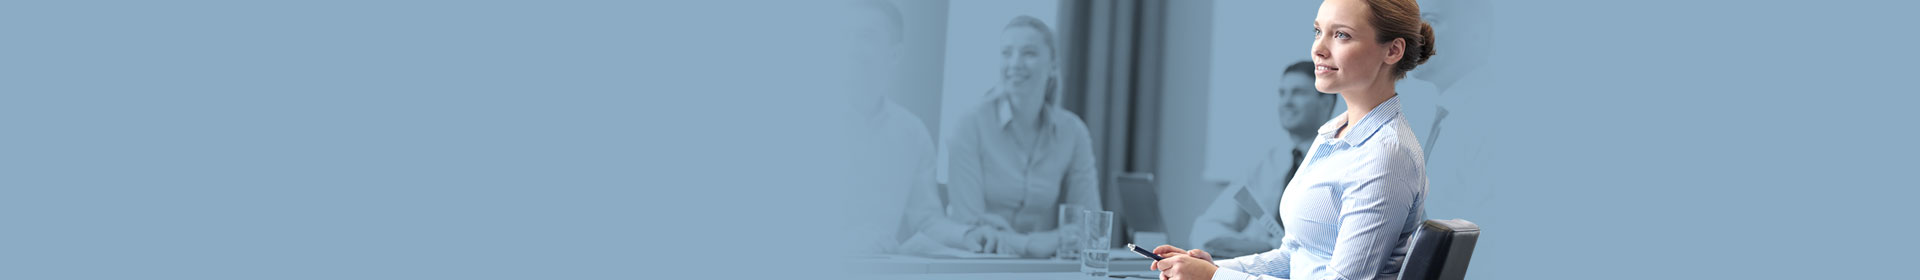 Individuali karjeros konsultacija